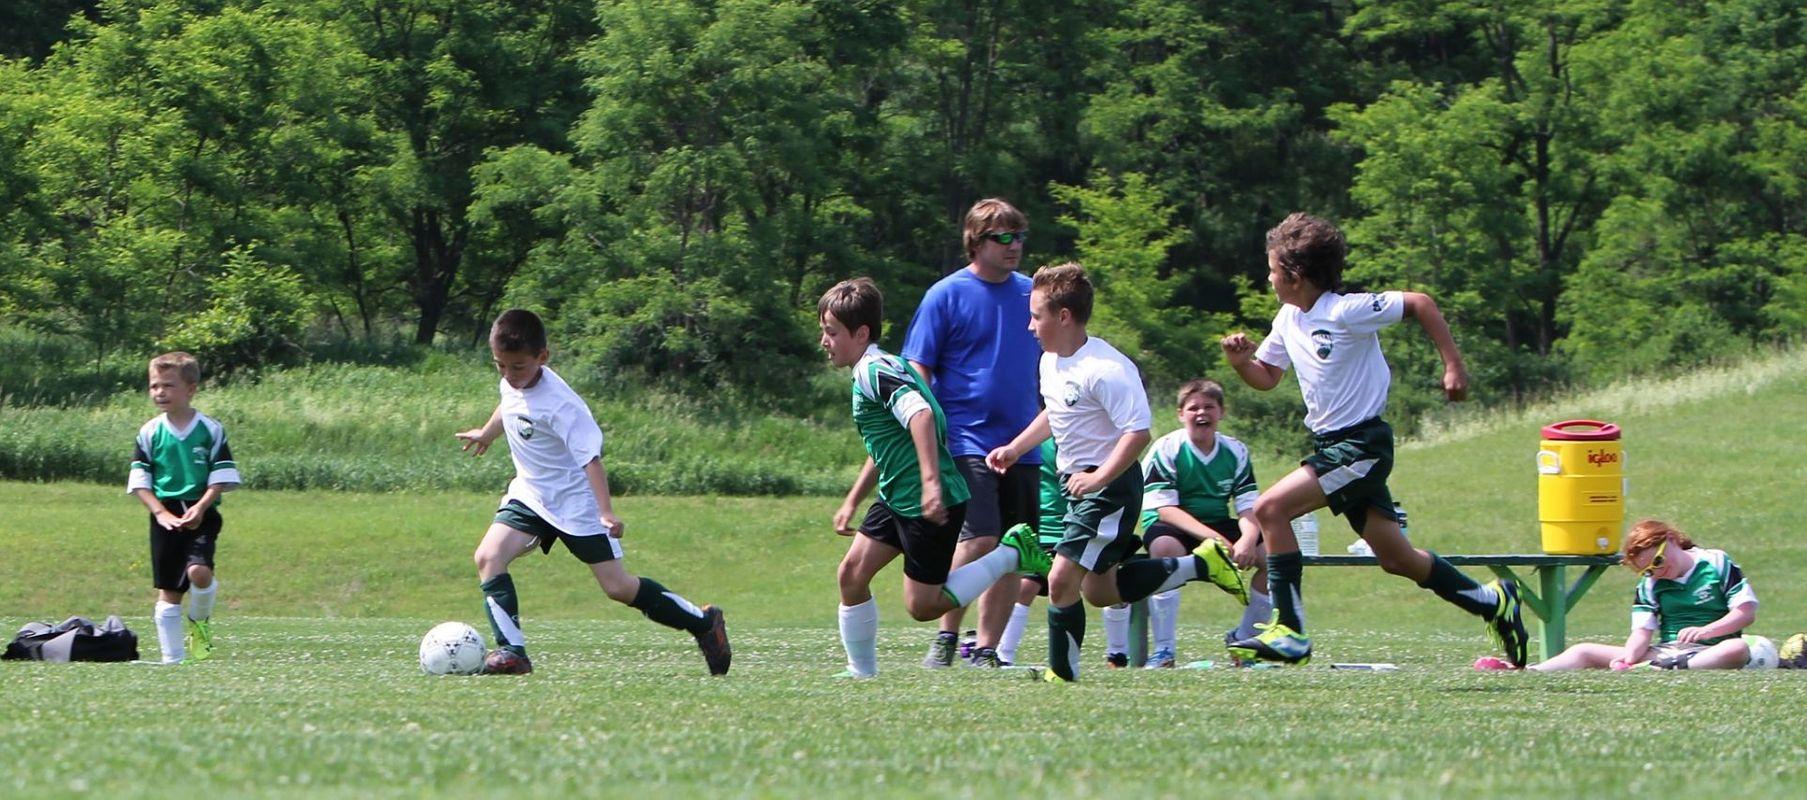 Youth Travel Soccer - Vestal Youth Soccer